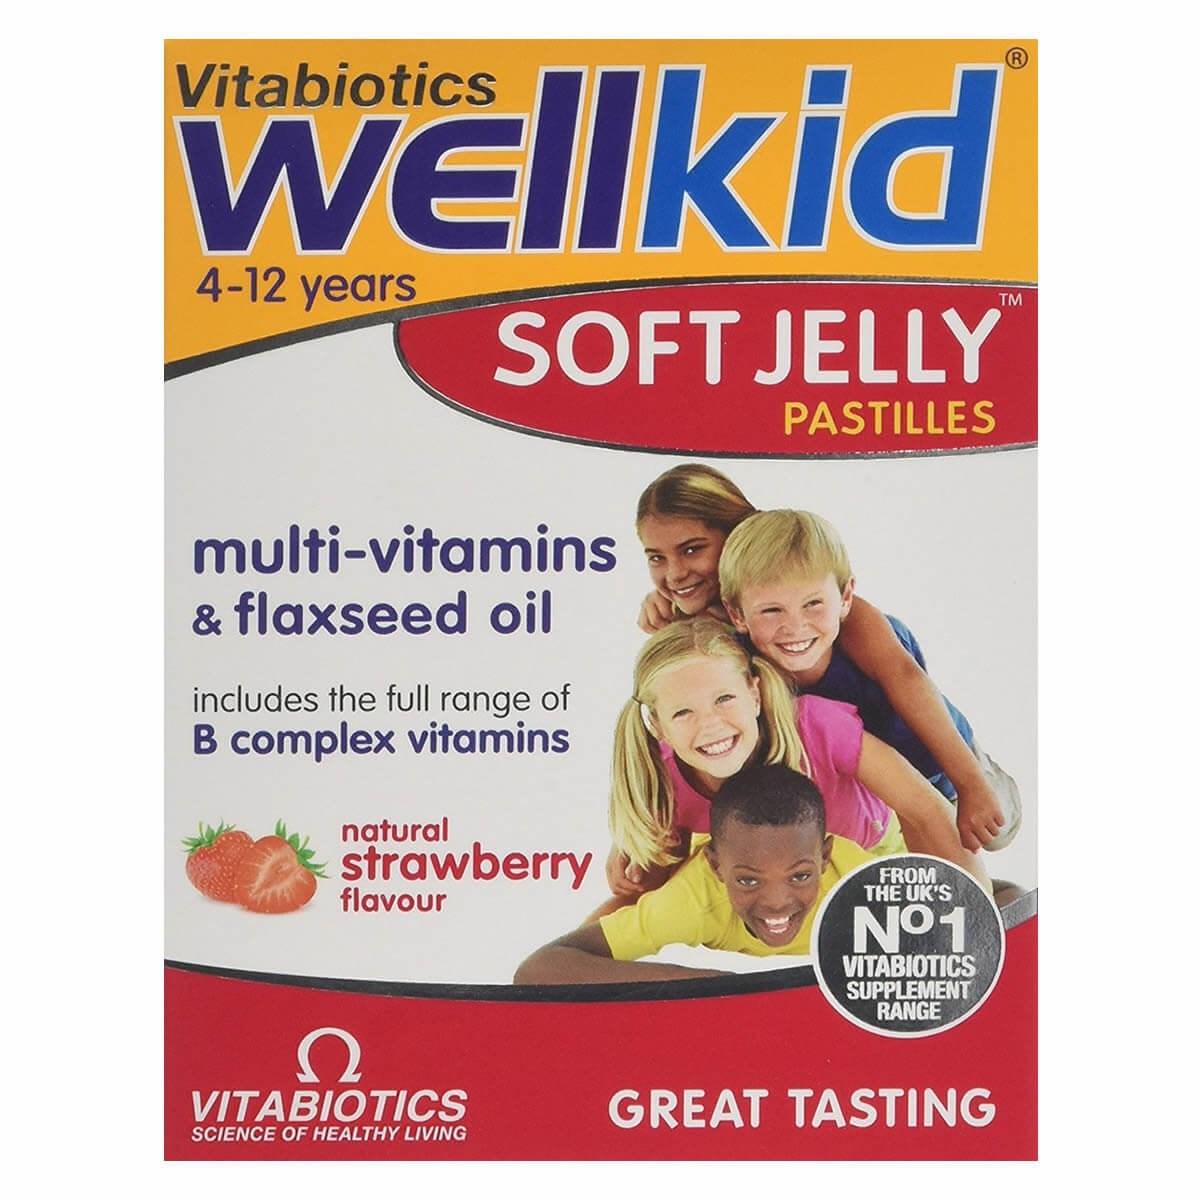 Vitabiotics WellKid Soft Jelly 30 Pastilles